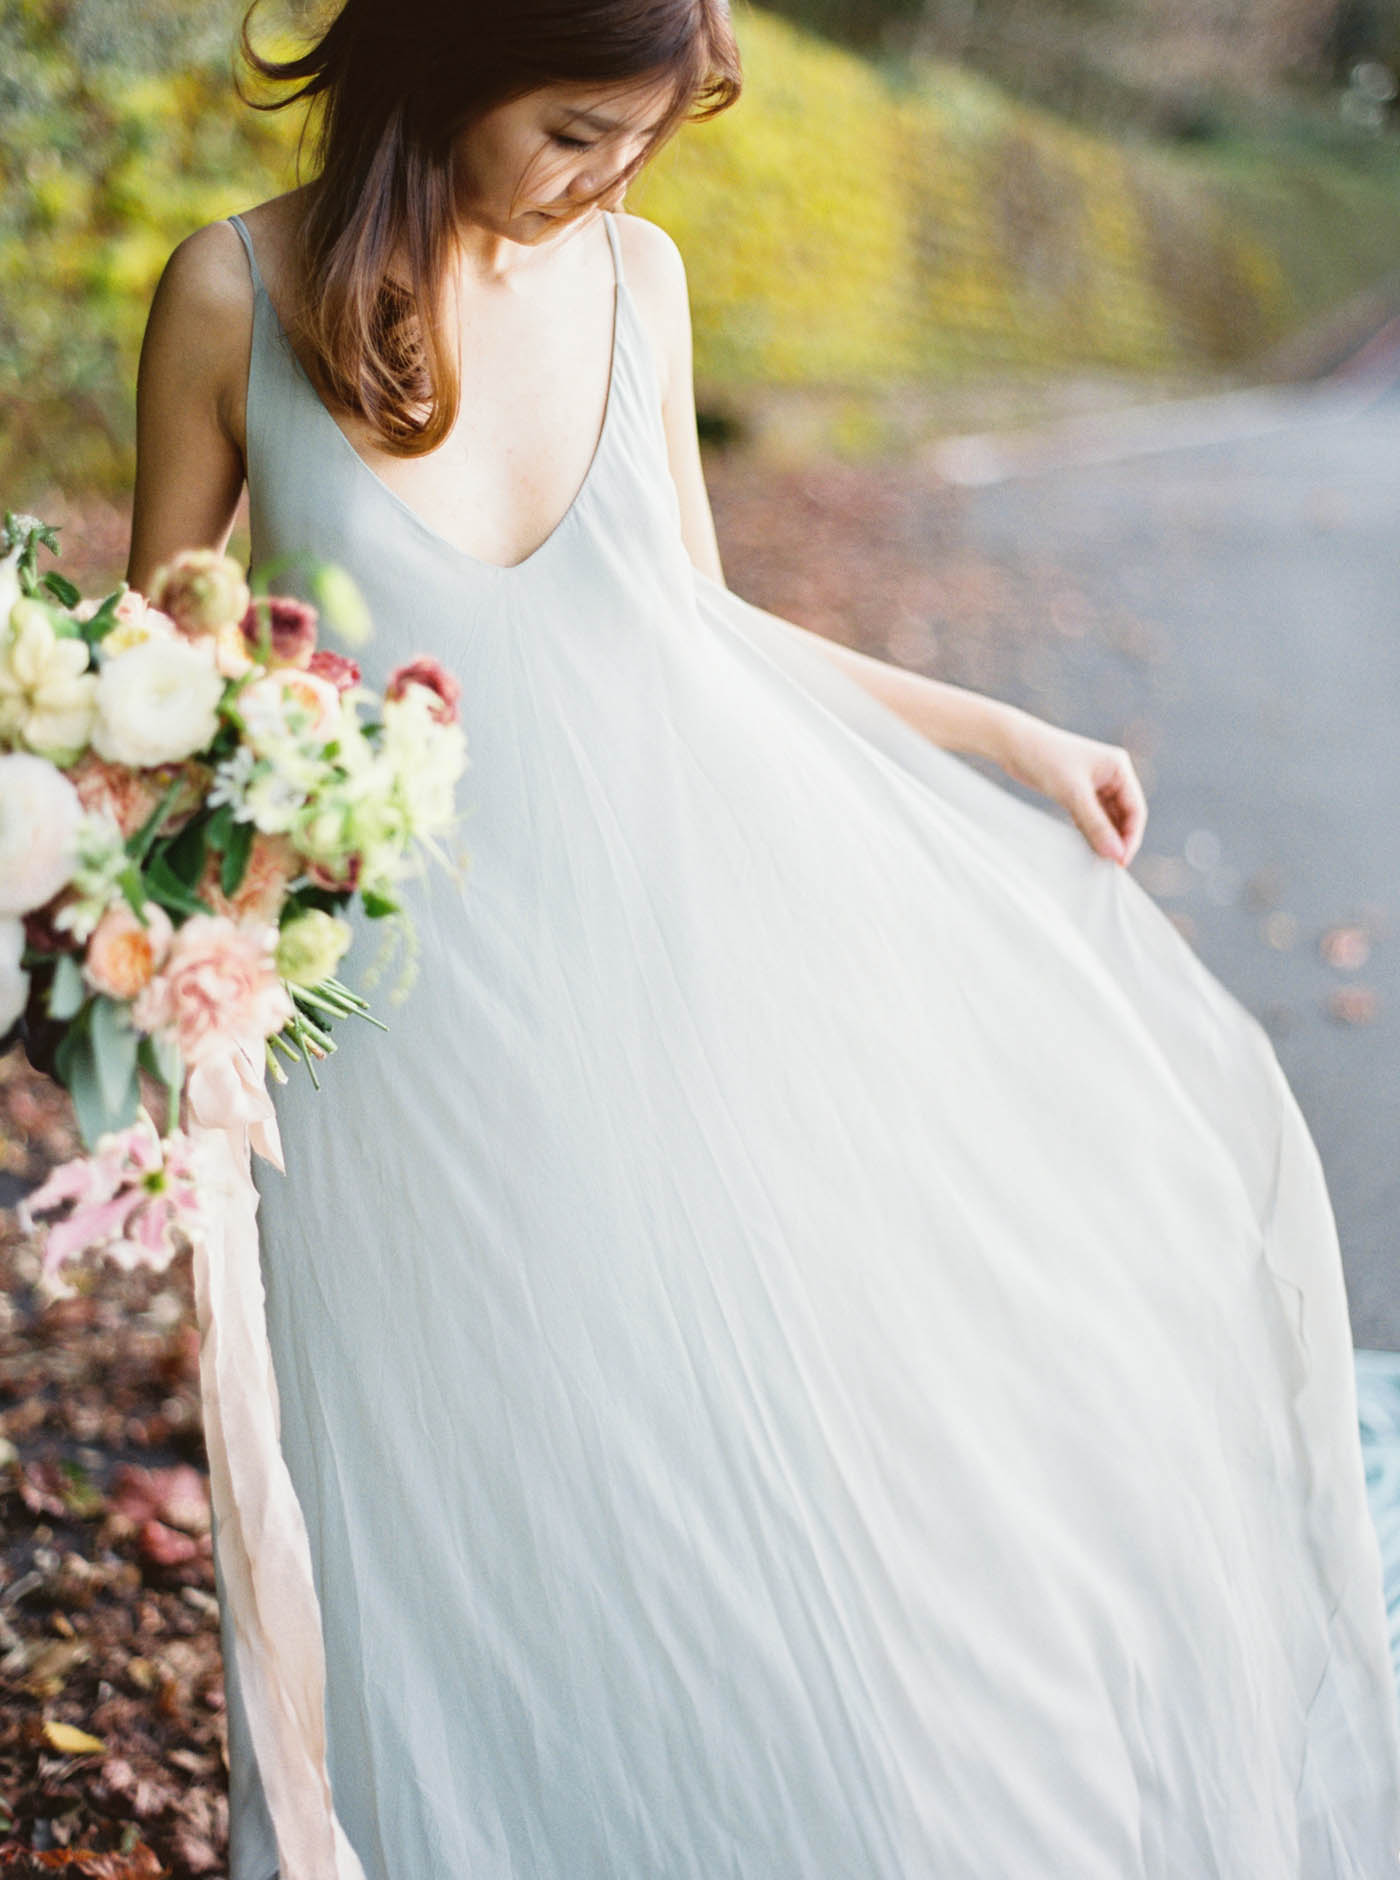 class jo 婚紗